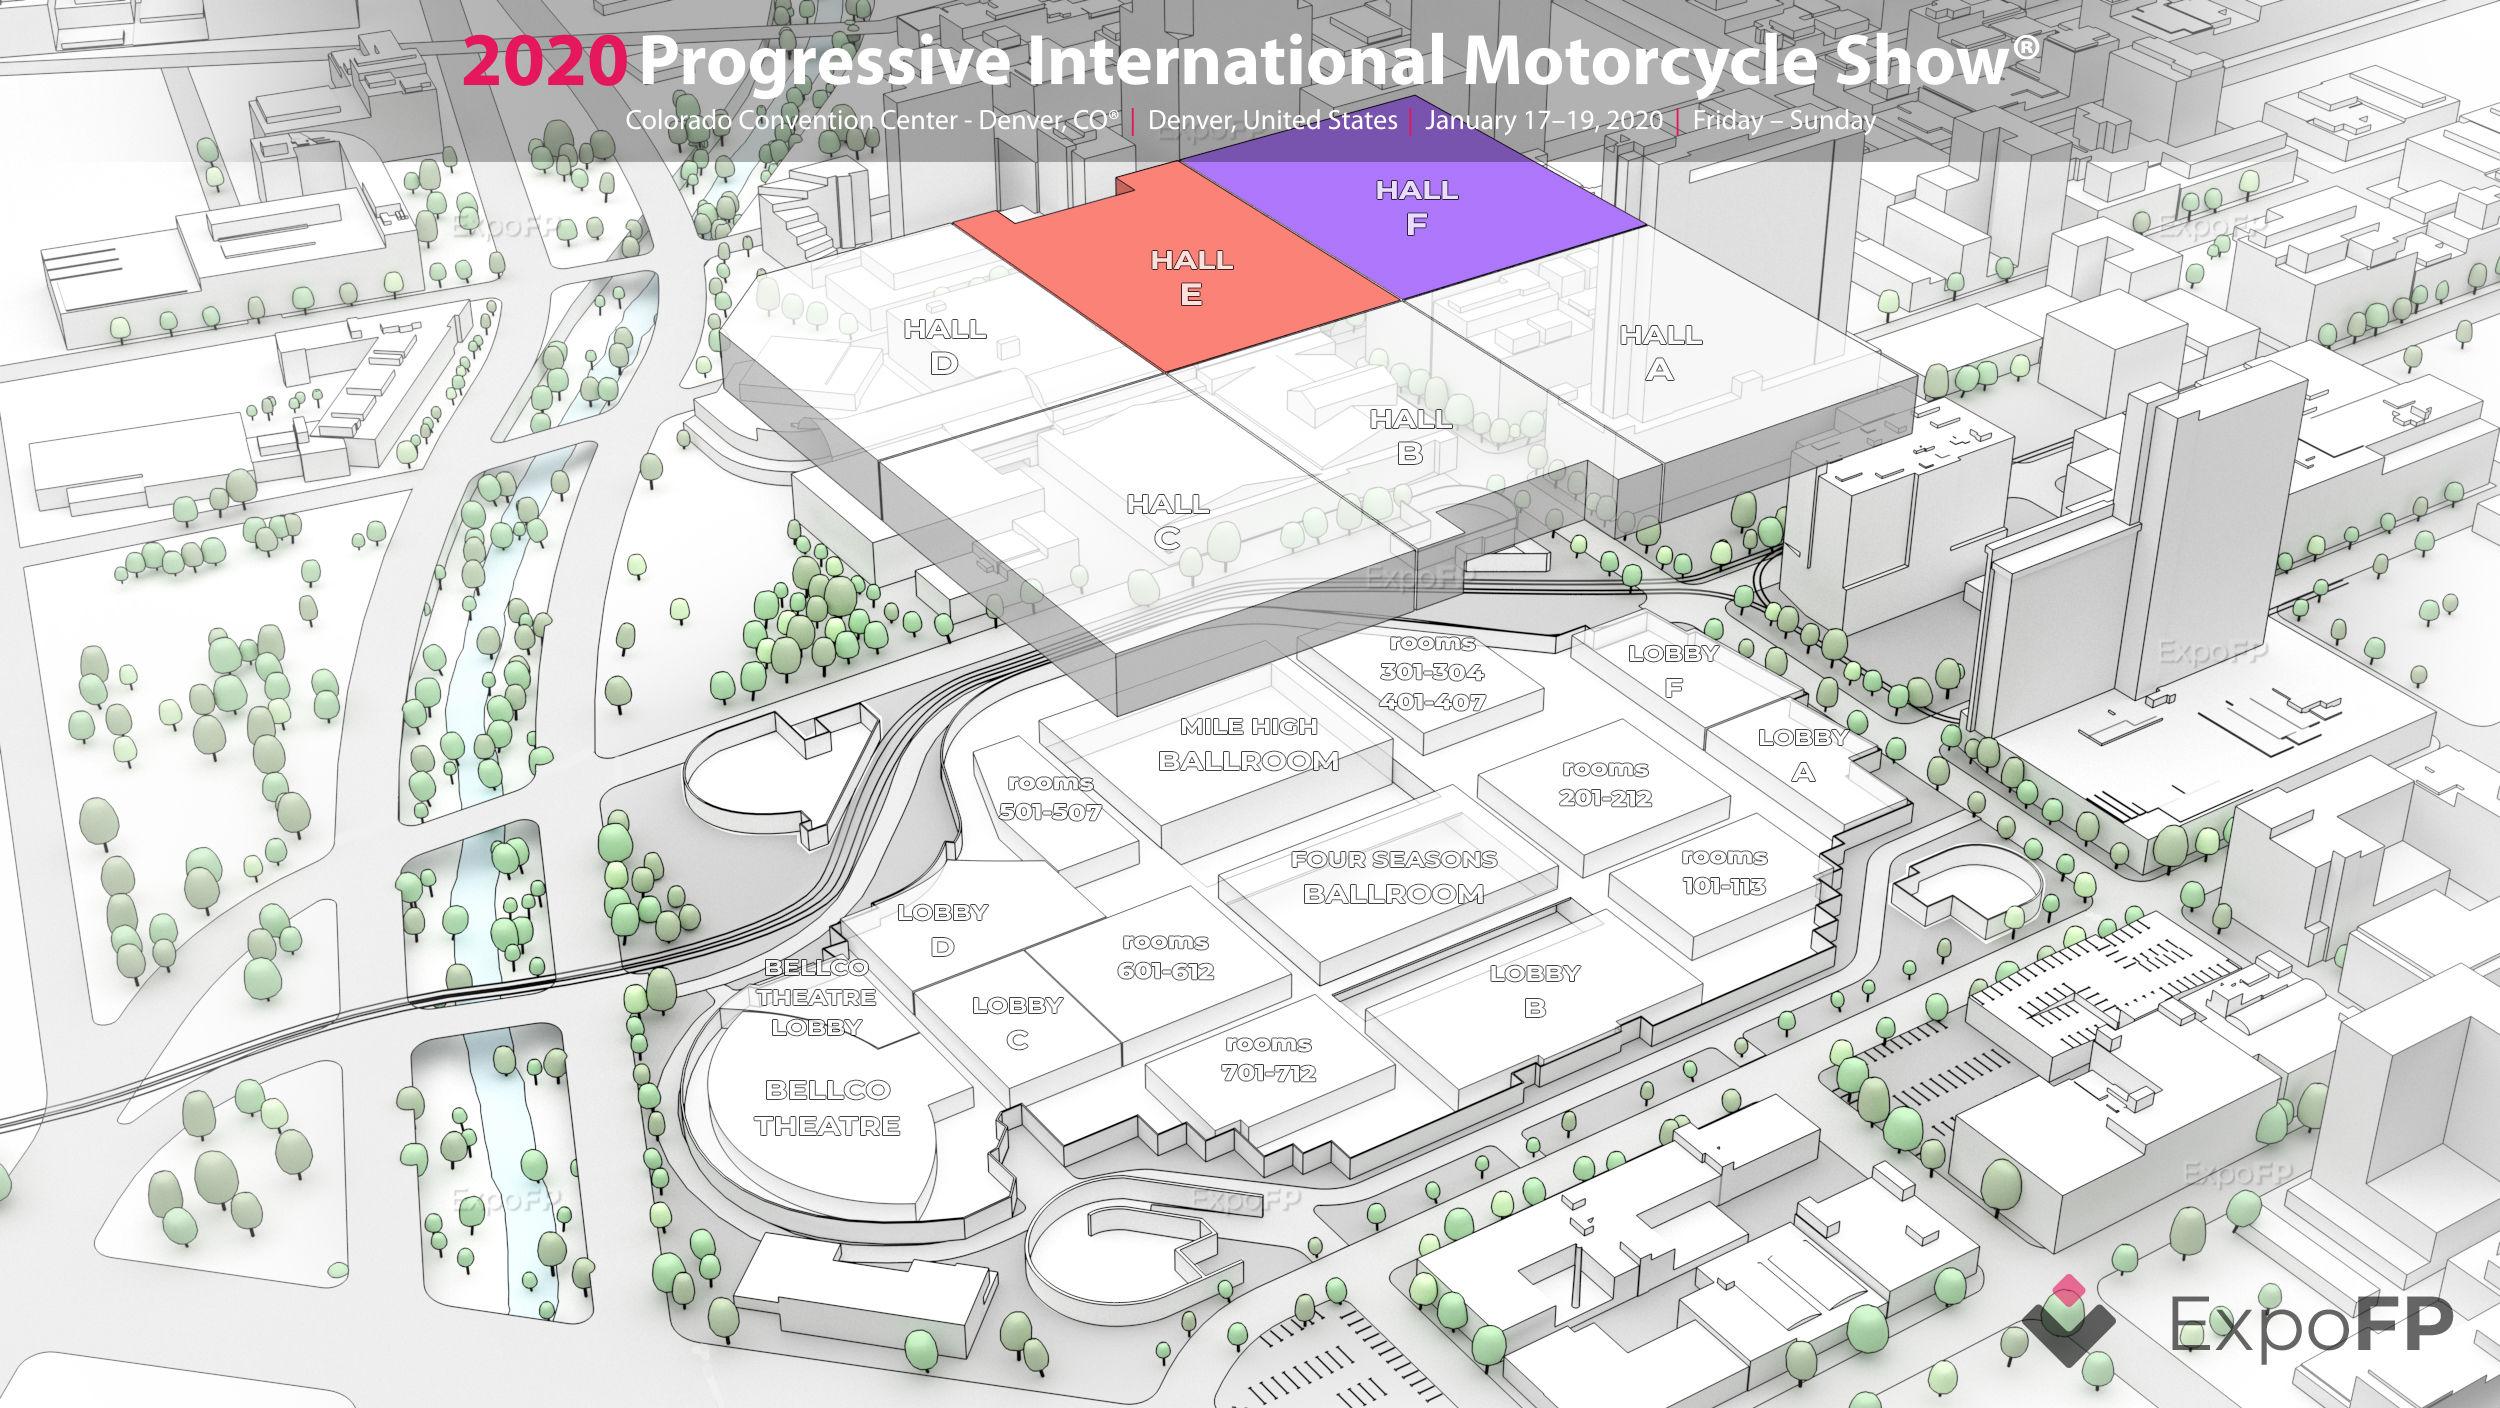 International Motorcycle Show 2020.Progressive International Motorcycle Show 2020 In Colorado